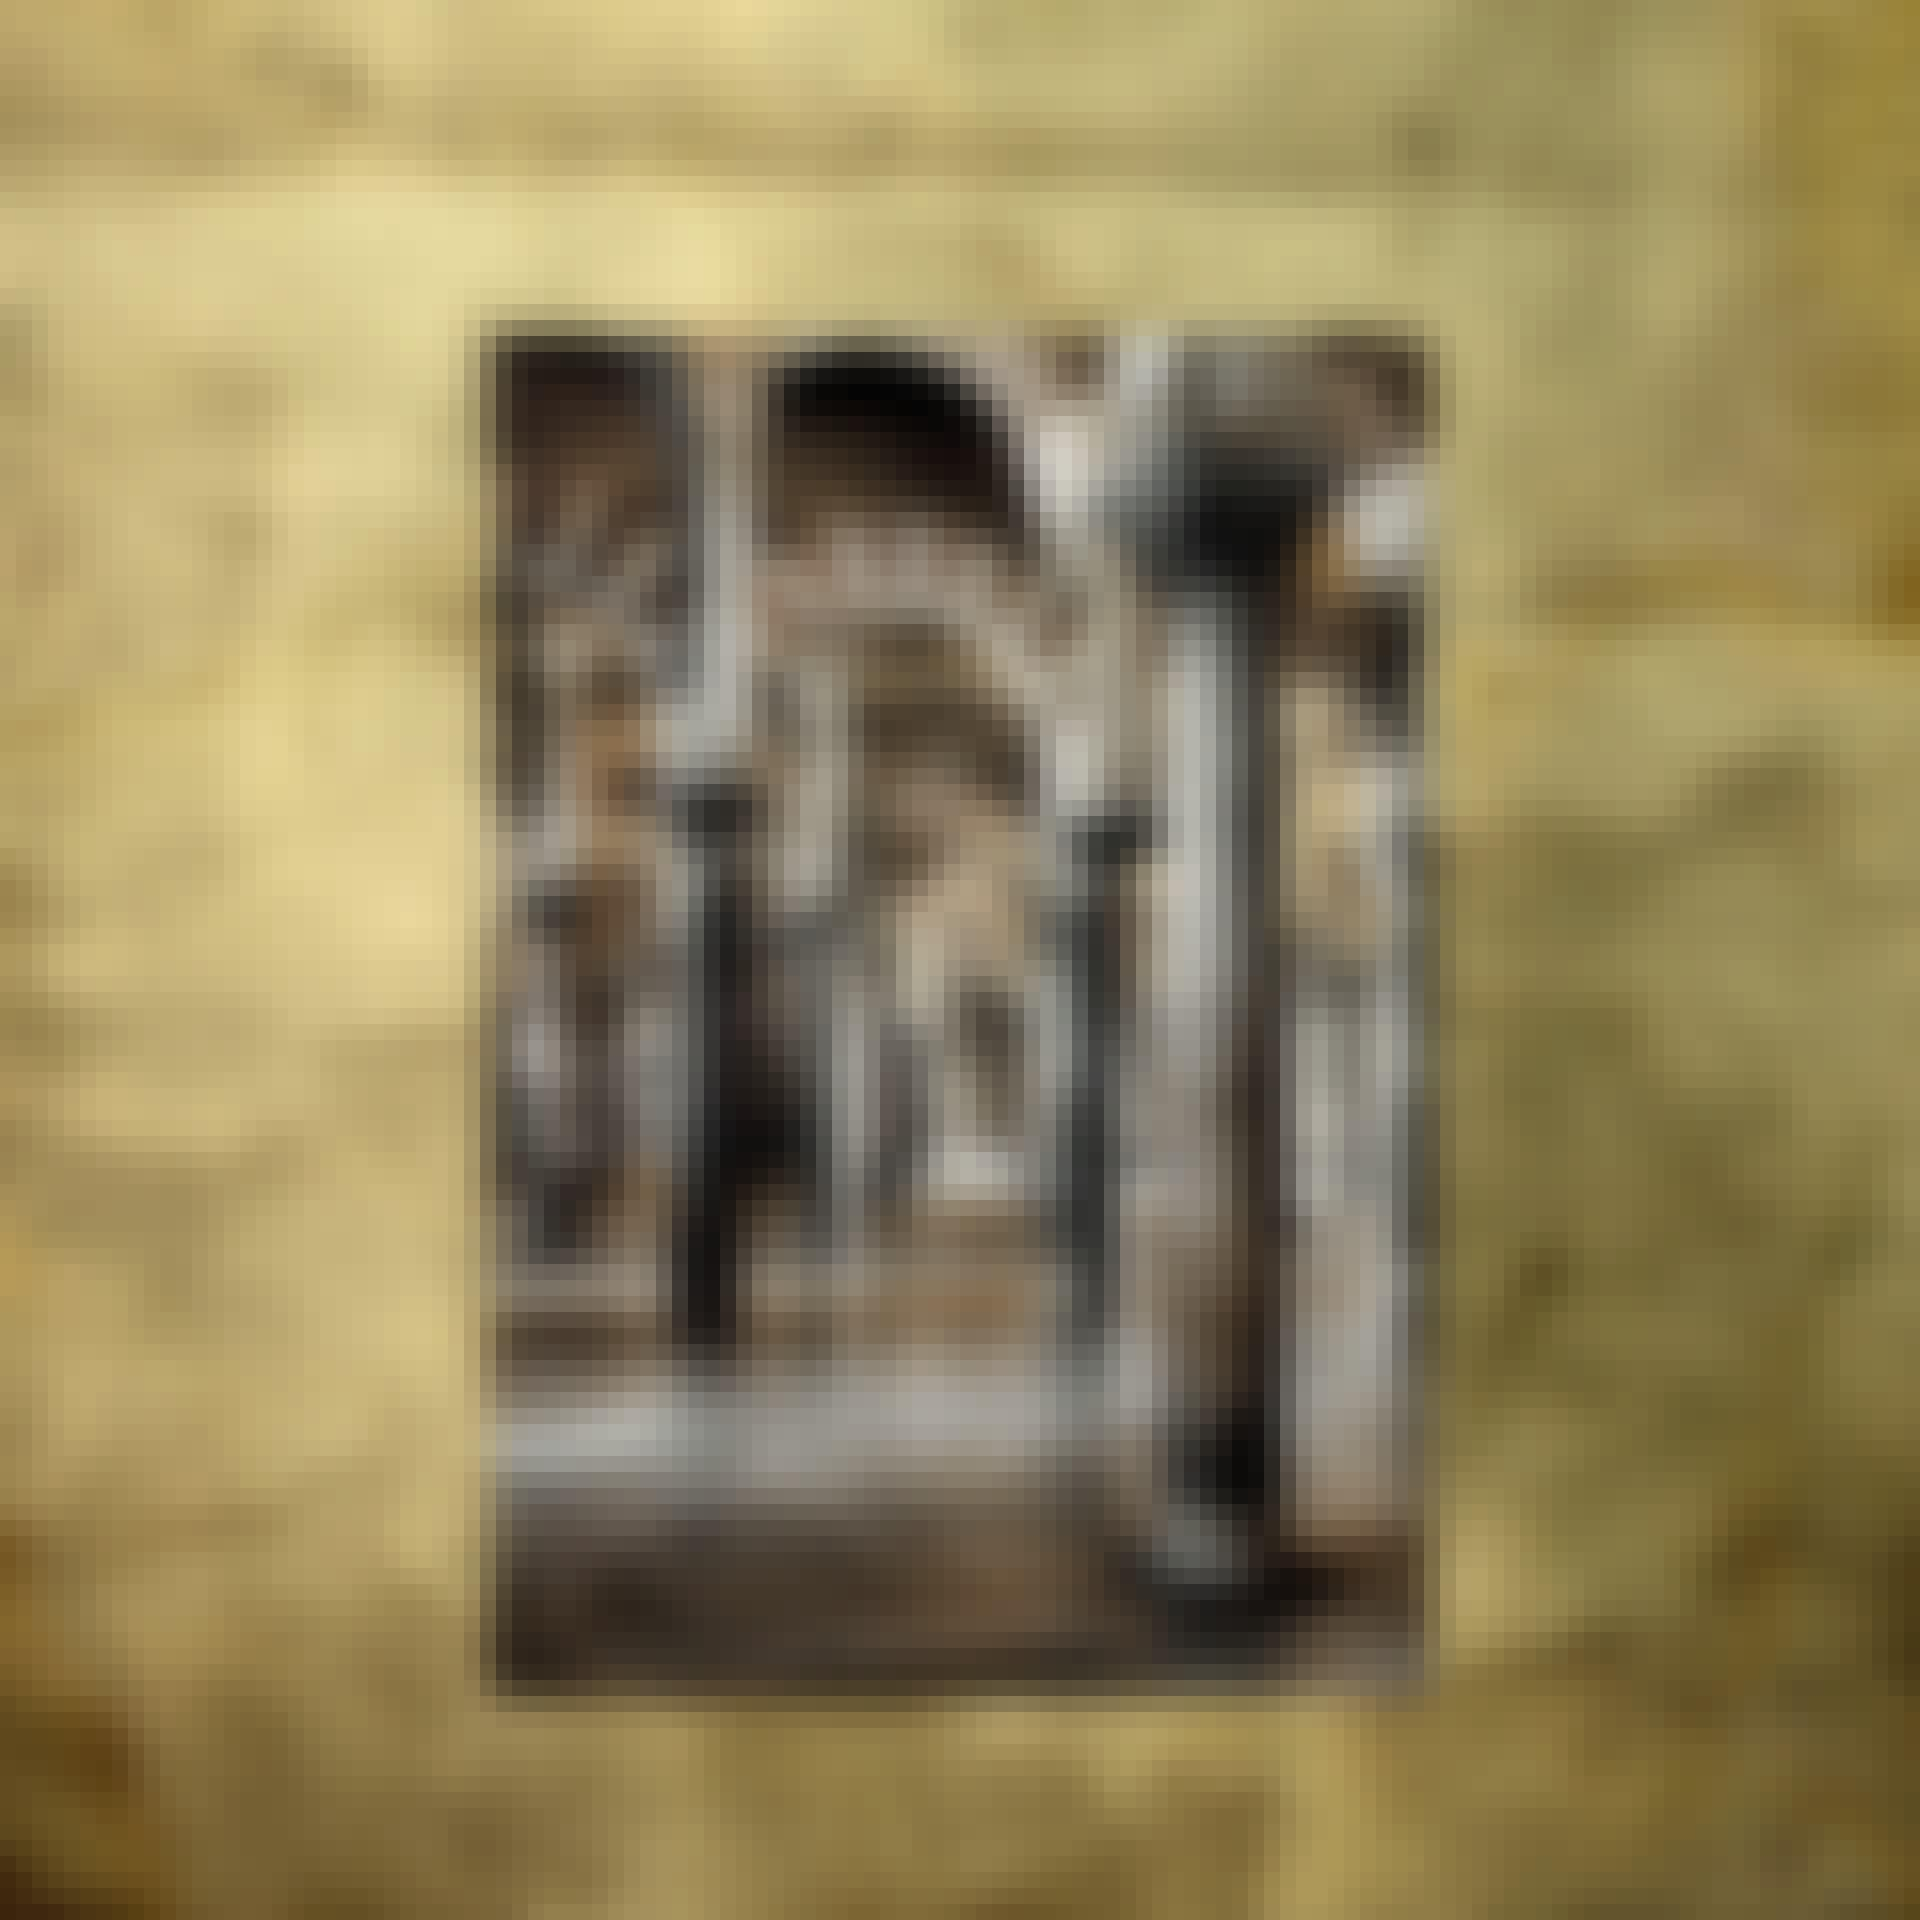 Romerske søjler